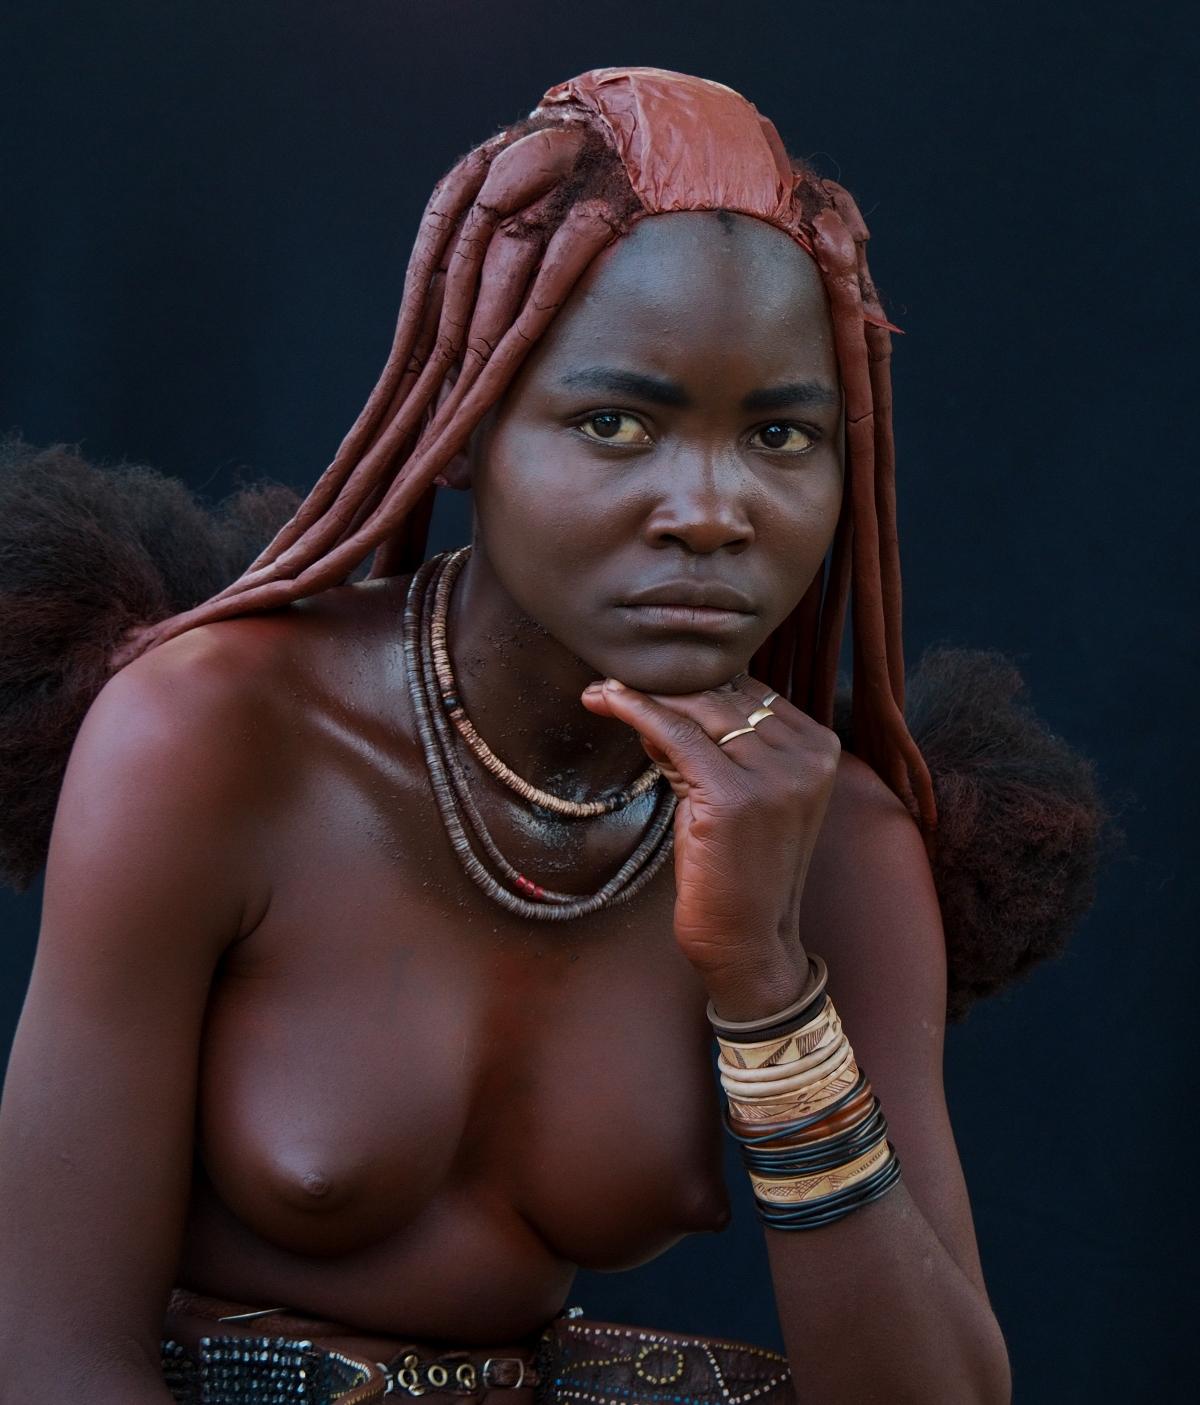 Himba girl, Namibia